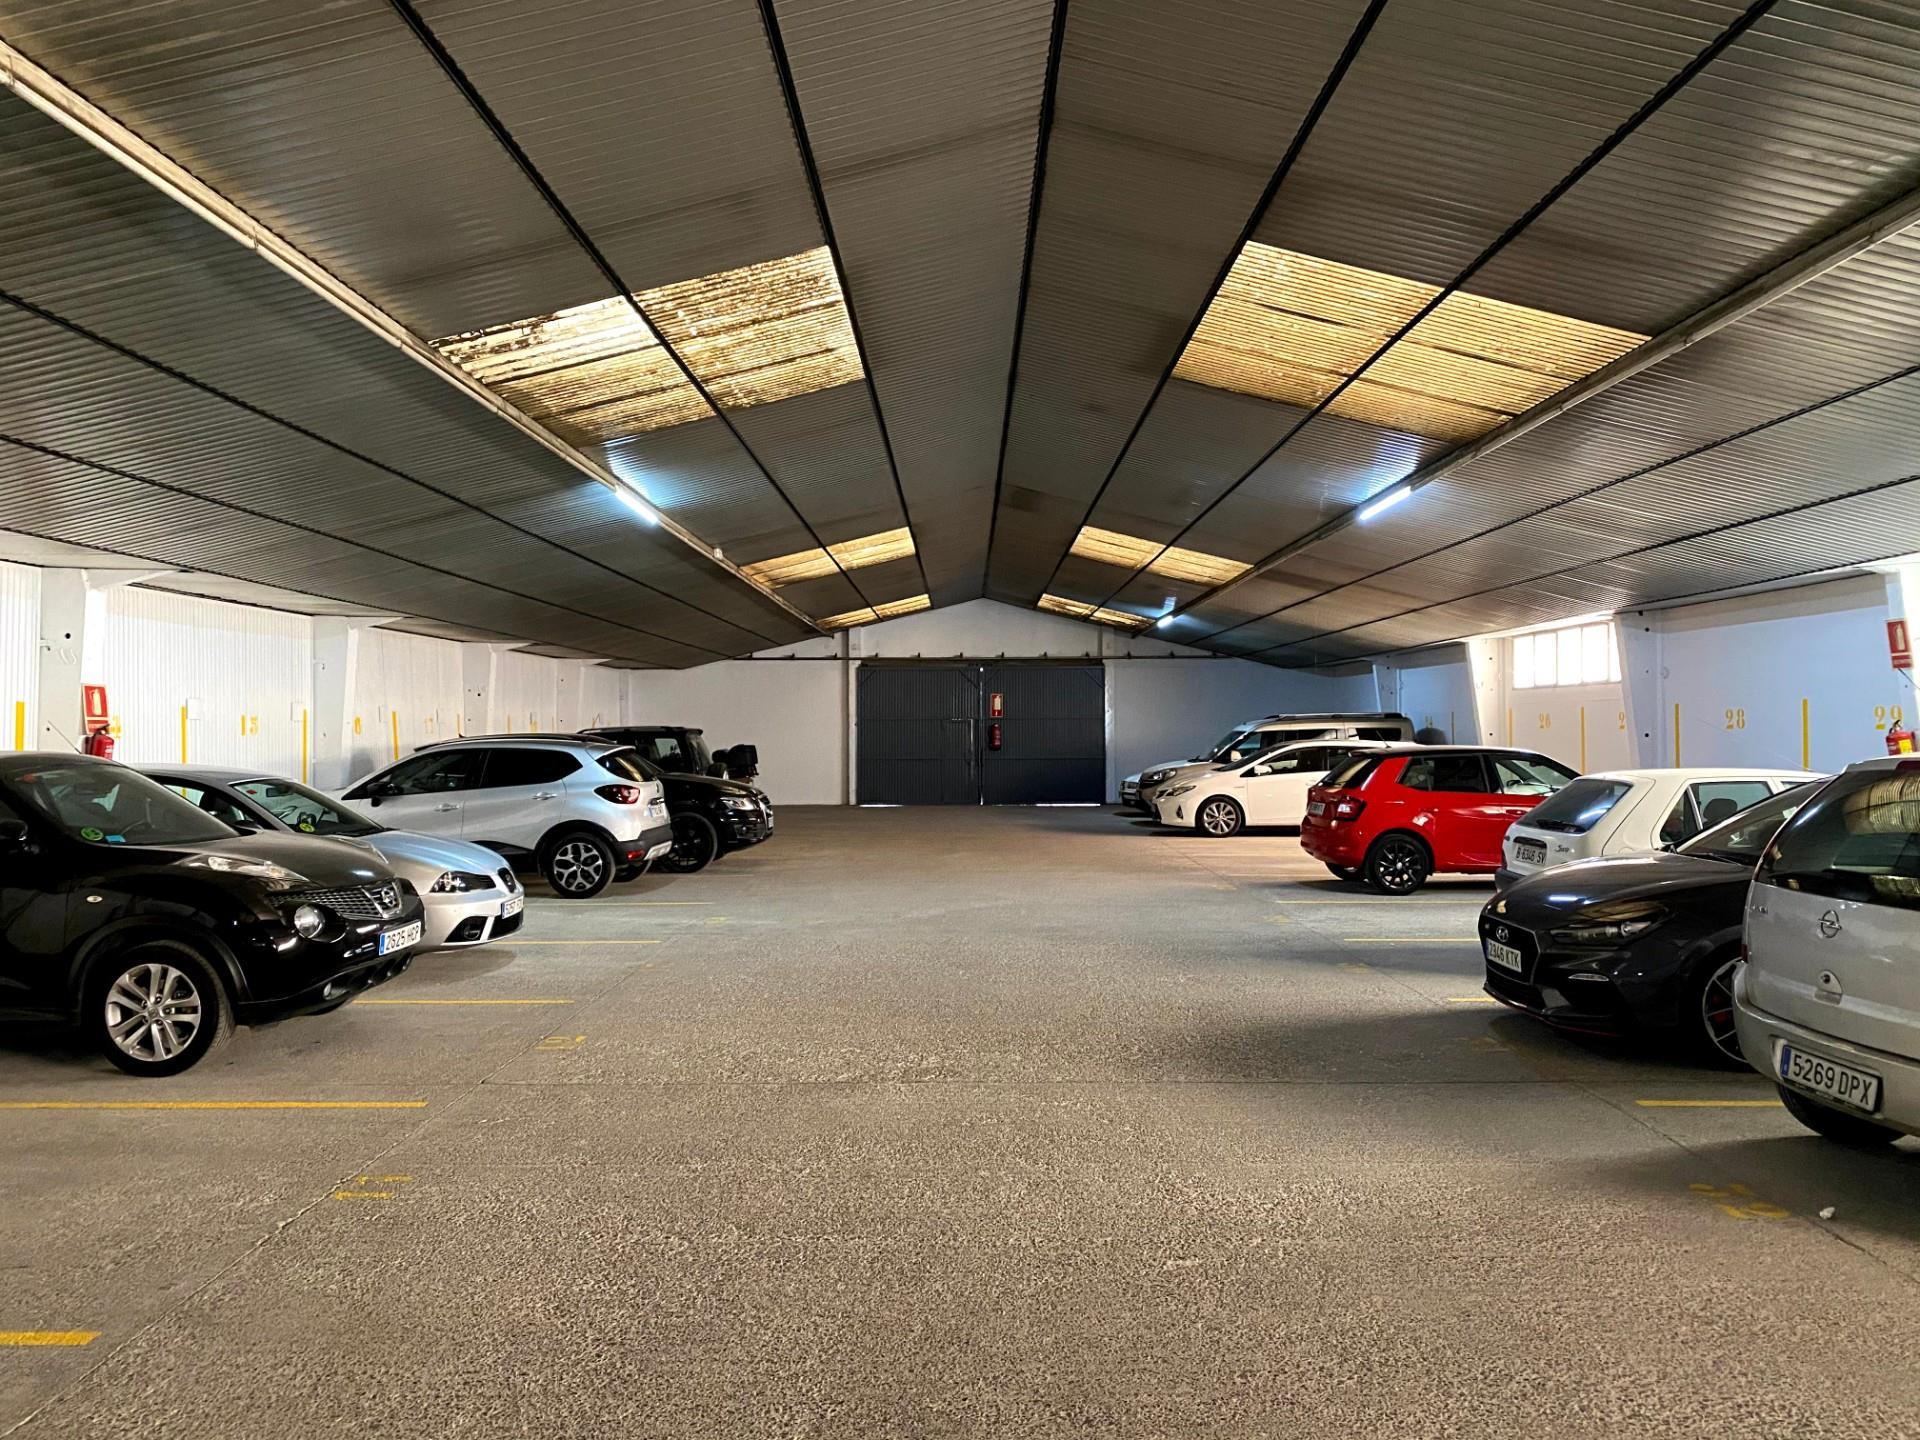 Miete Autoparkplatz  Carrer de pierola. El poble sec / carrer de pierola